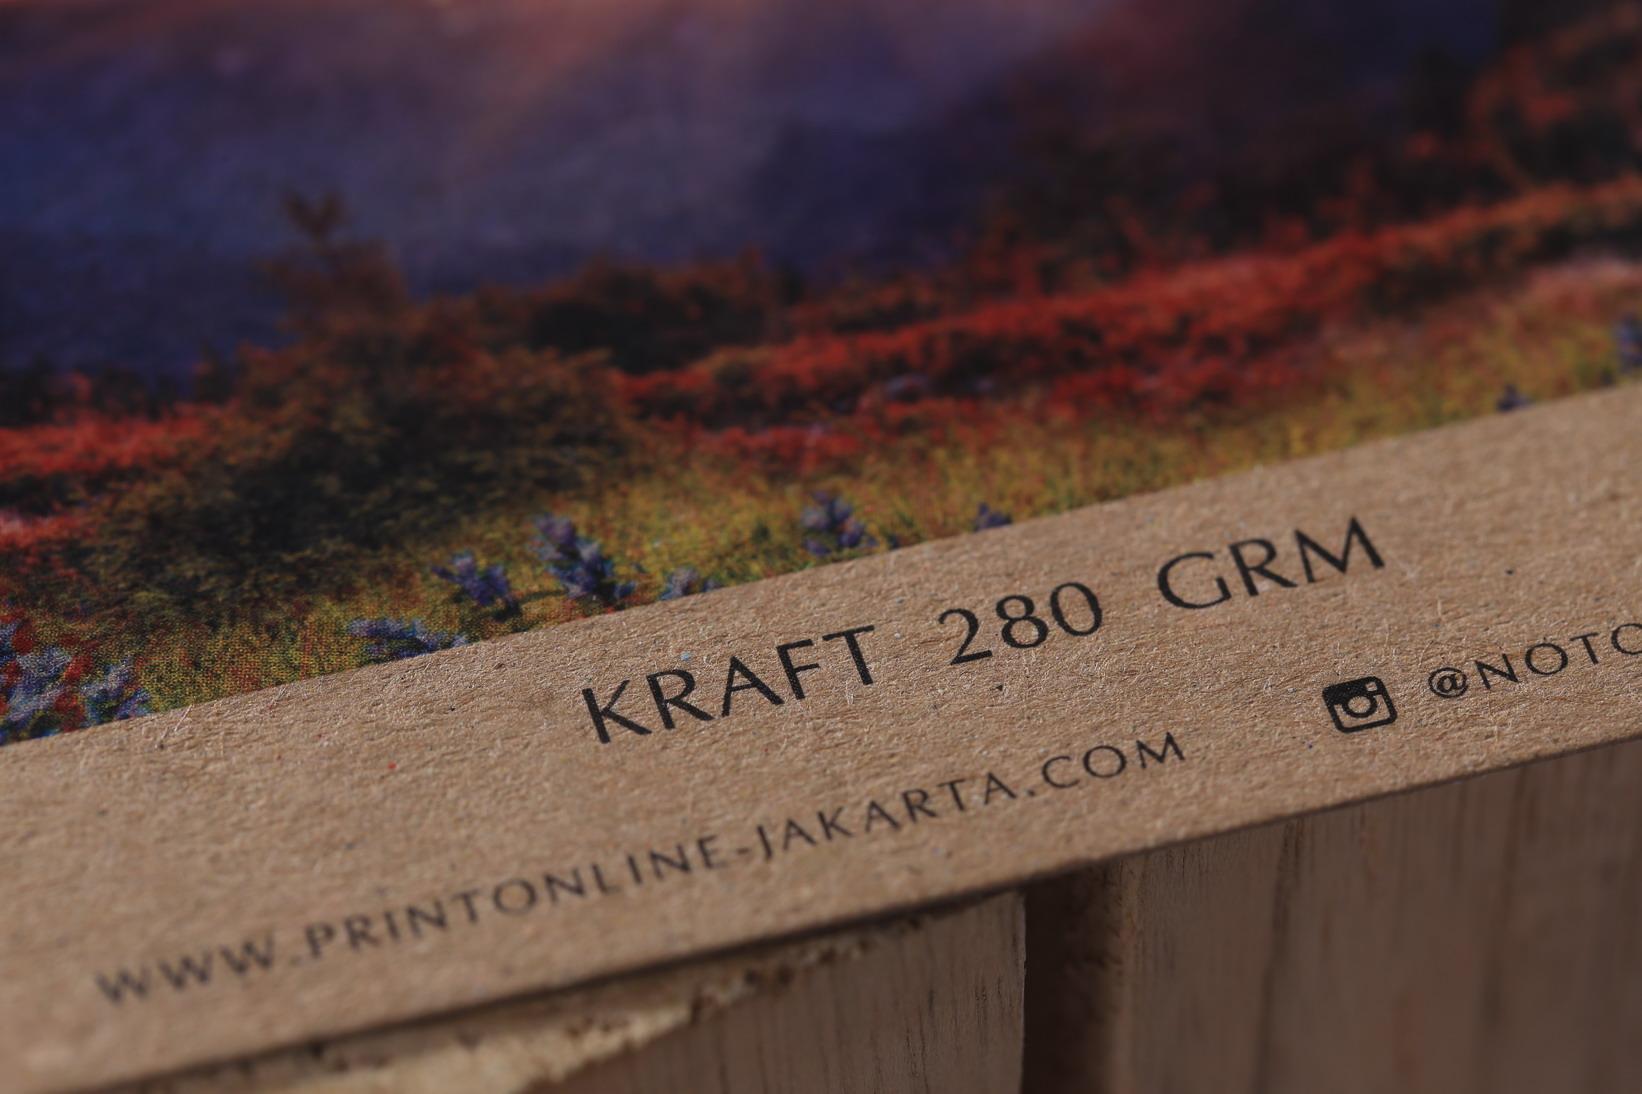 Kraft 280 grm